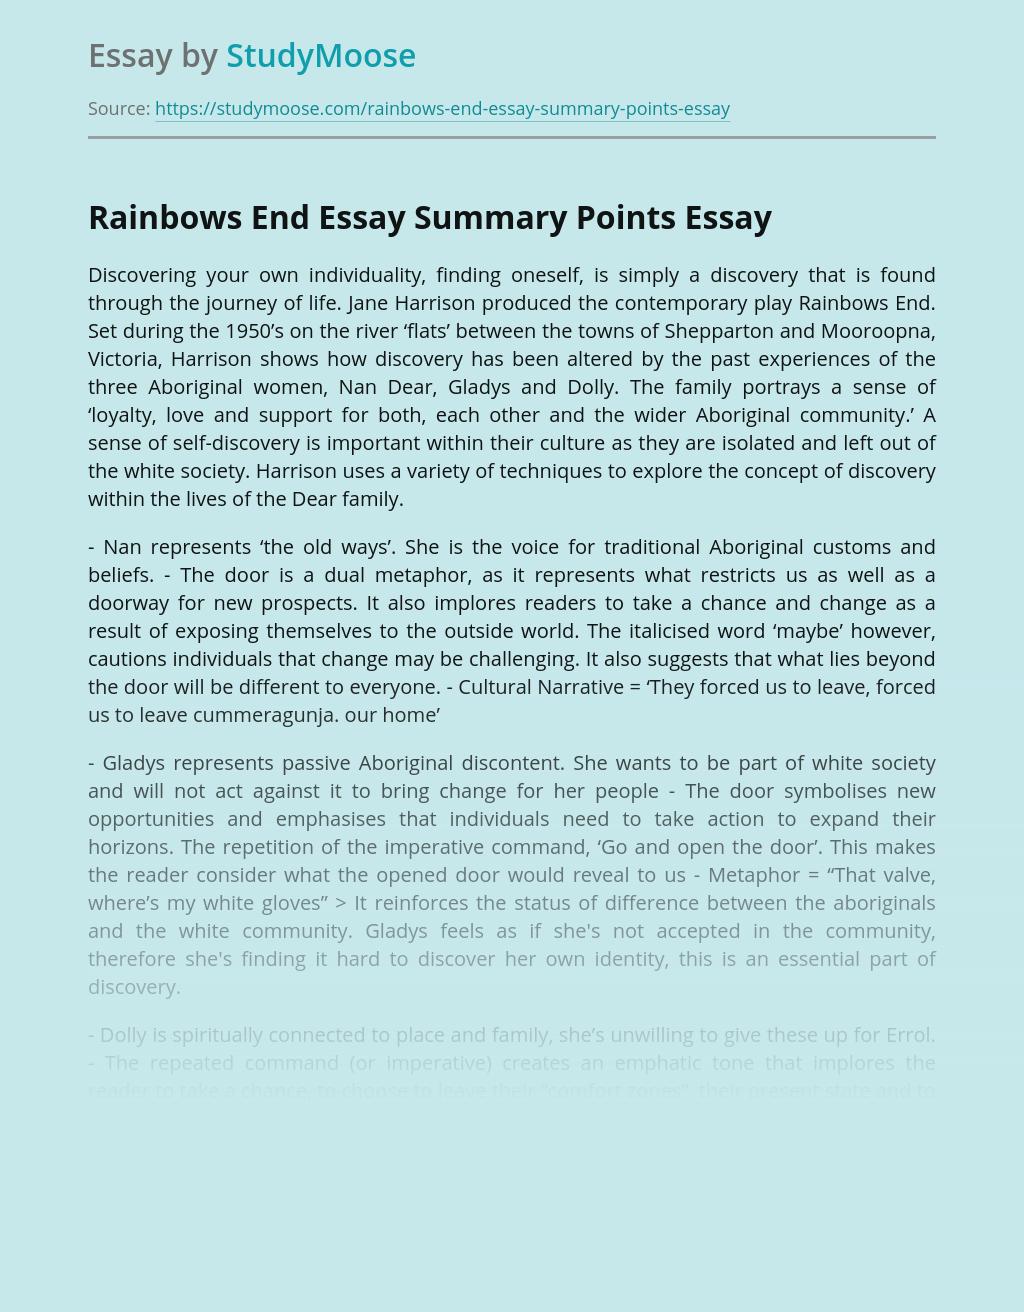 Rainbows End Essay Summary Points